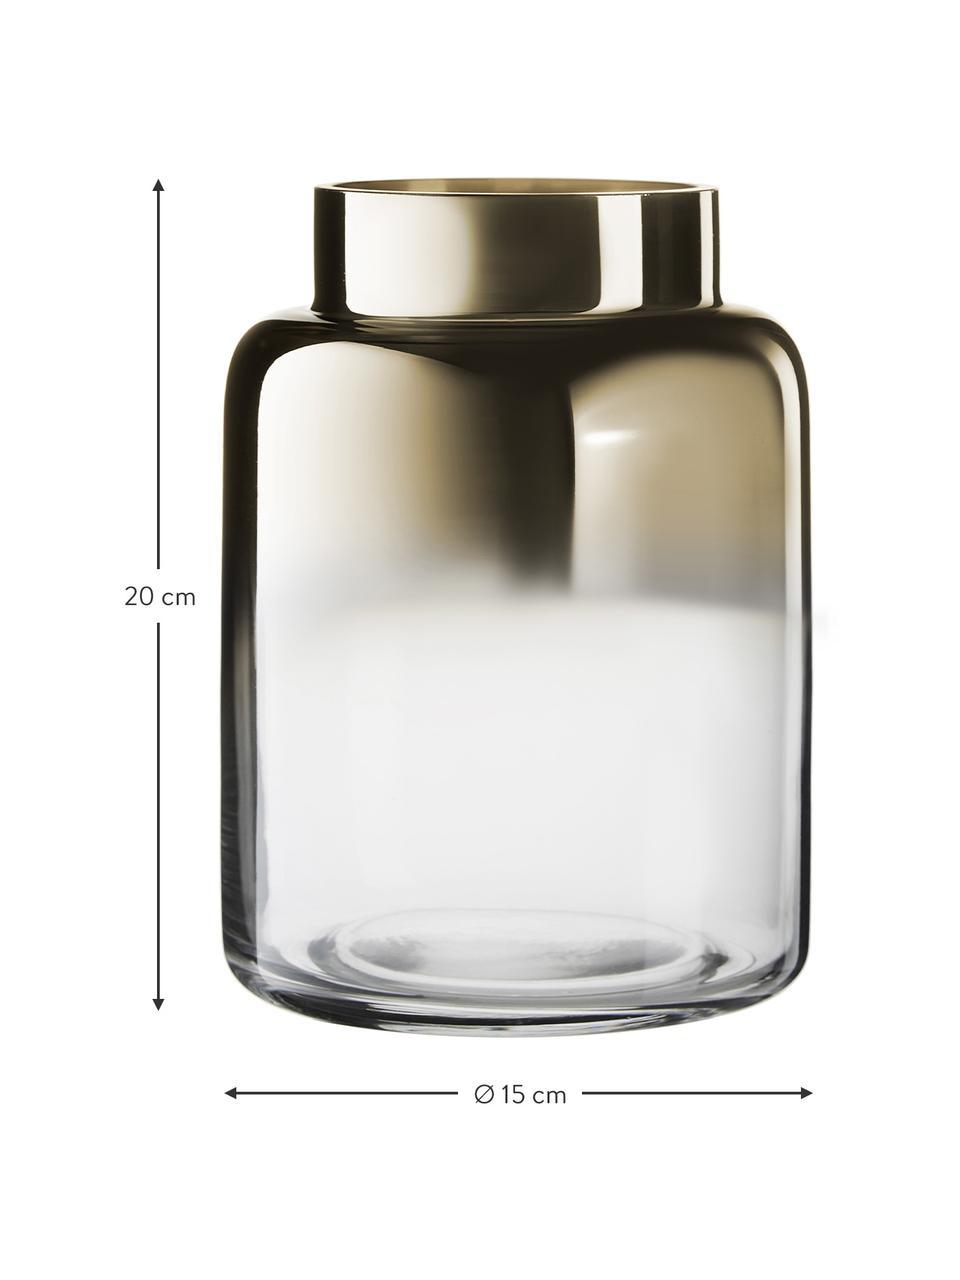 Mundgeblasene Glasvase Uma, Glas, Transparent,Gold, Ø 15 x H 20 cm